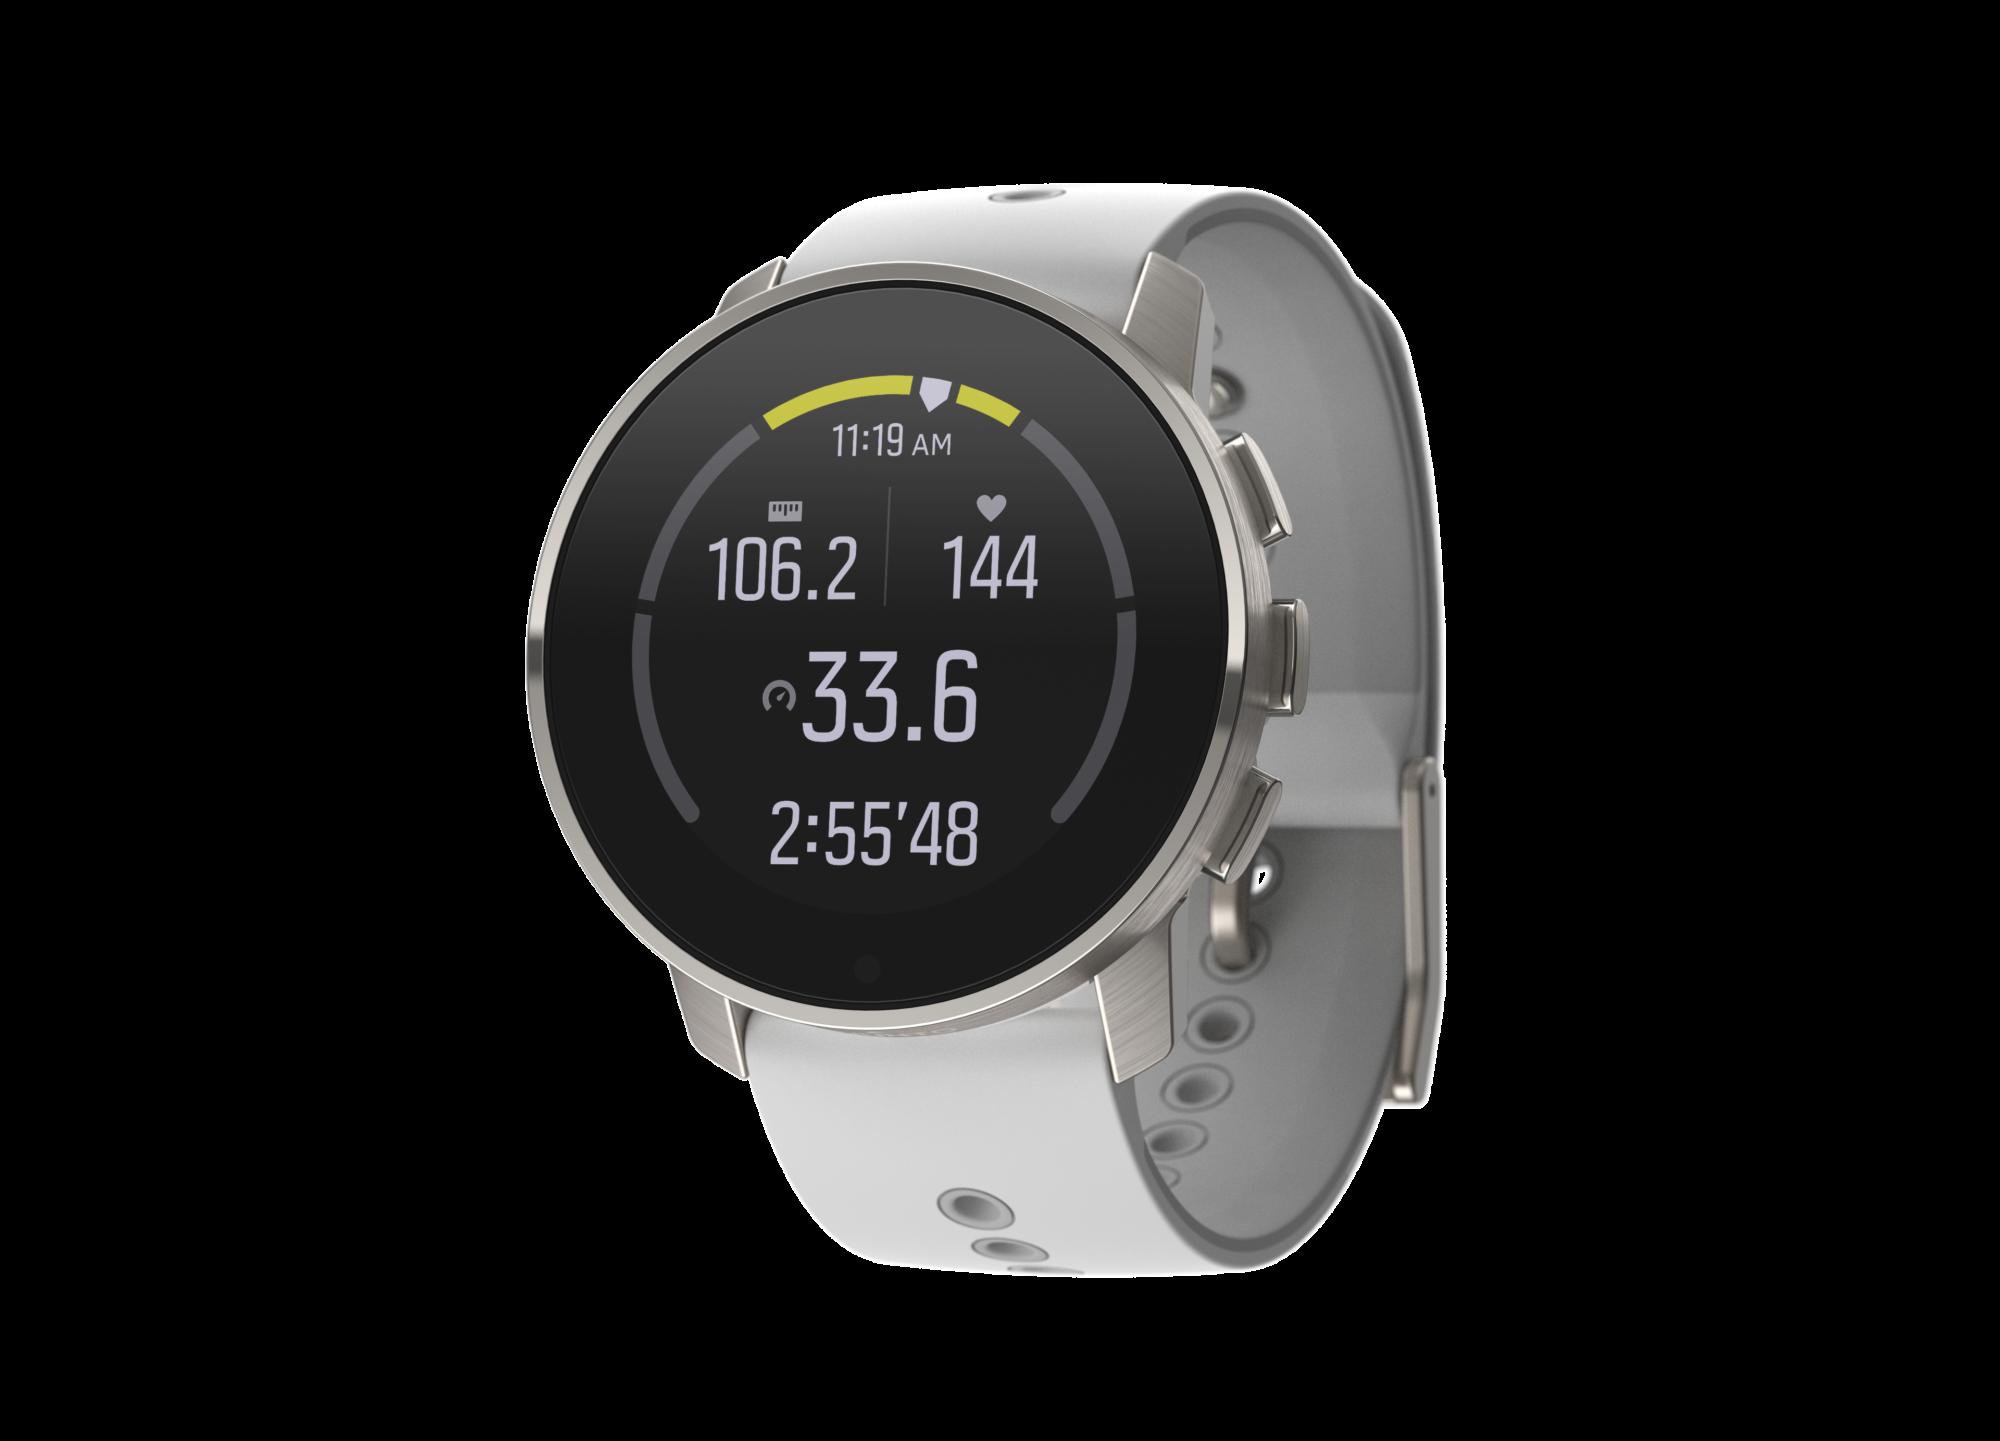 titanium-white-front-quarter-2-exercise-cycling-basic1-metric